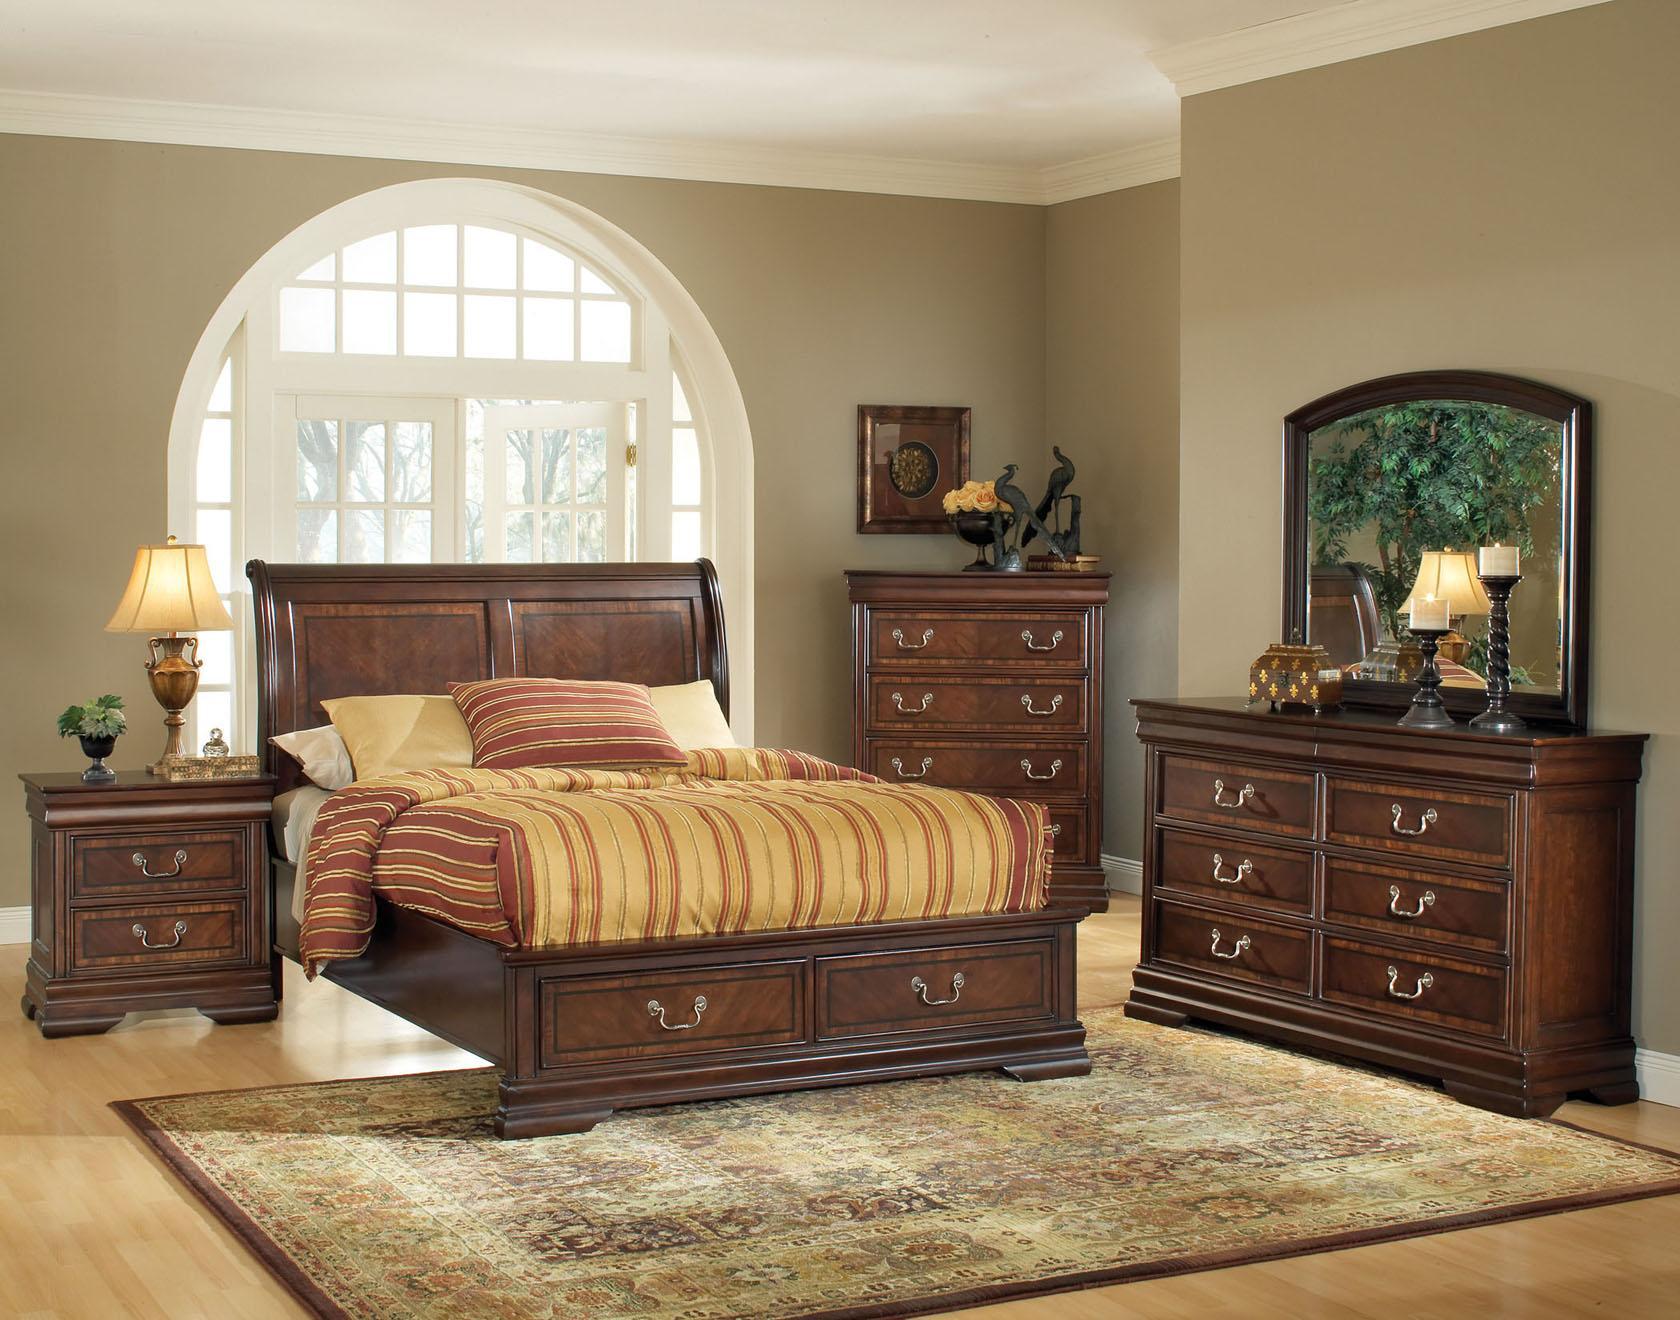 Acme Furniture Hennessy California King Bedroom Group - Item Number: 19444CK-HB+19444CK-FB+44CKRL+55+54